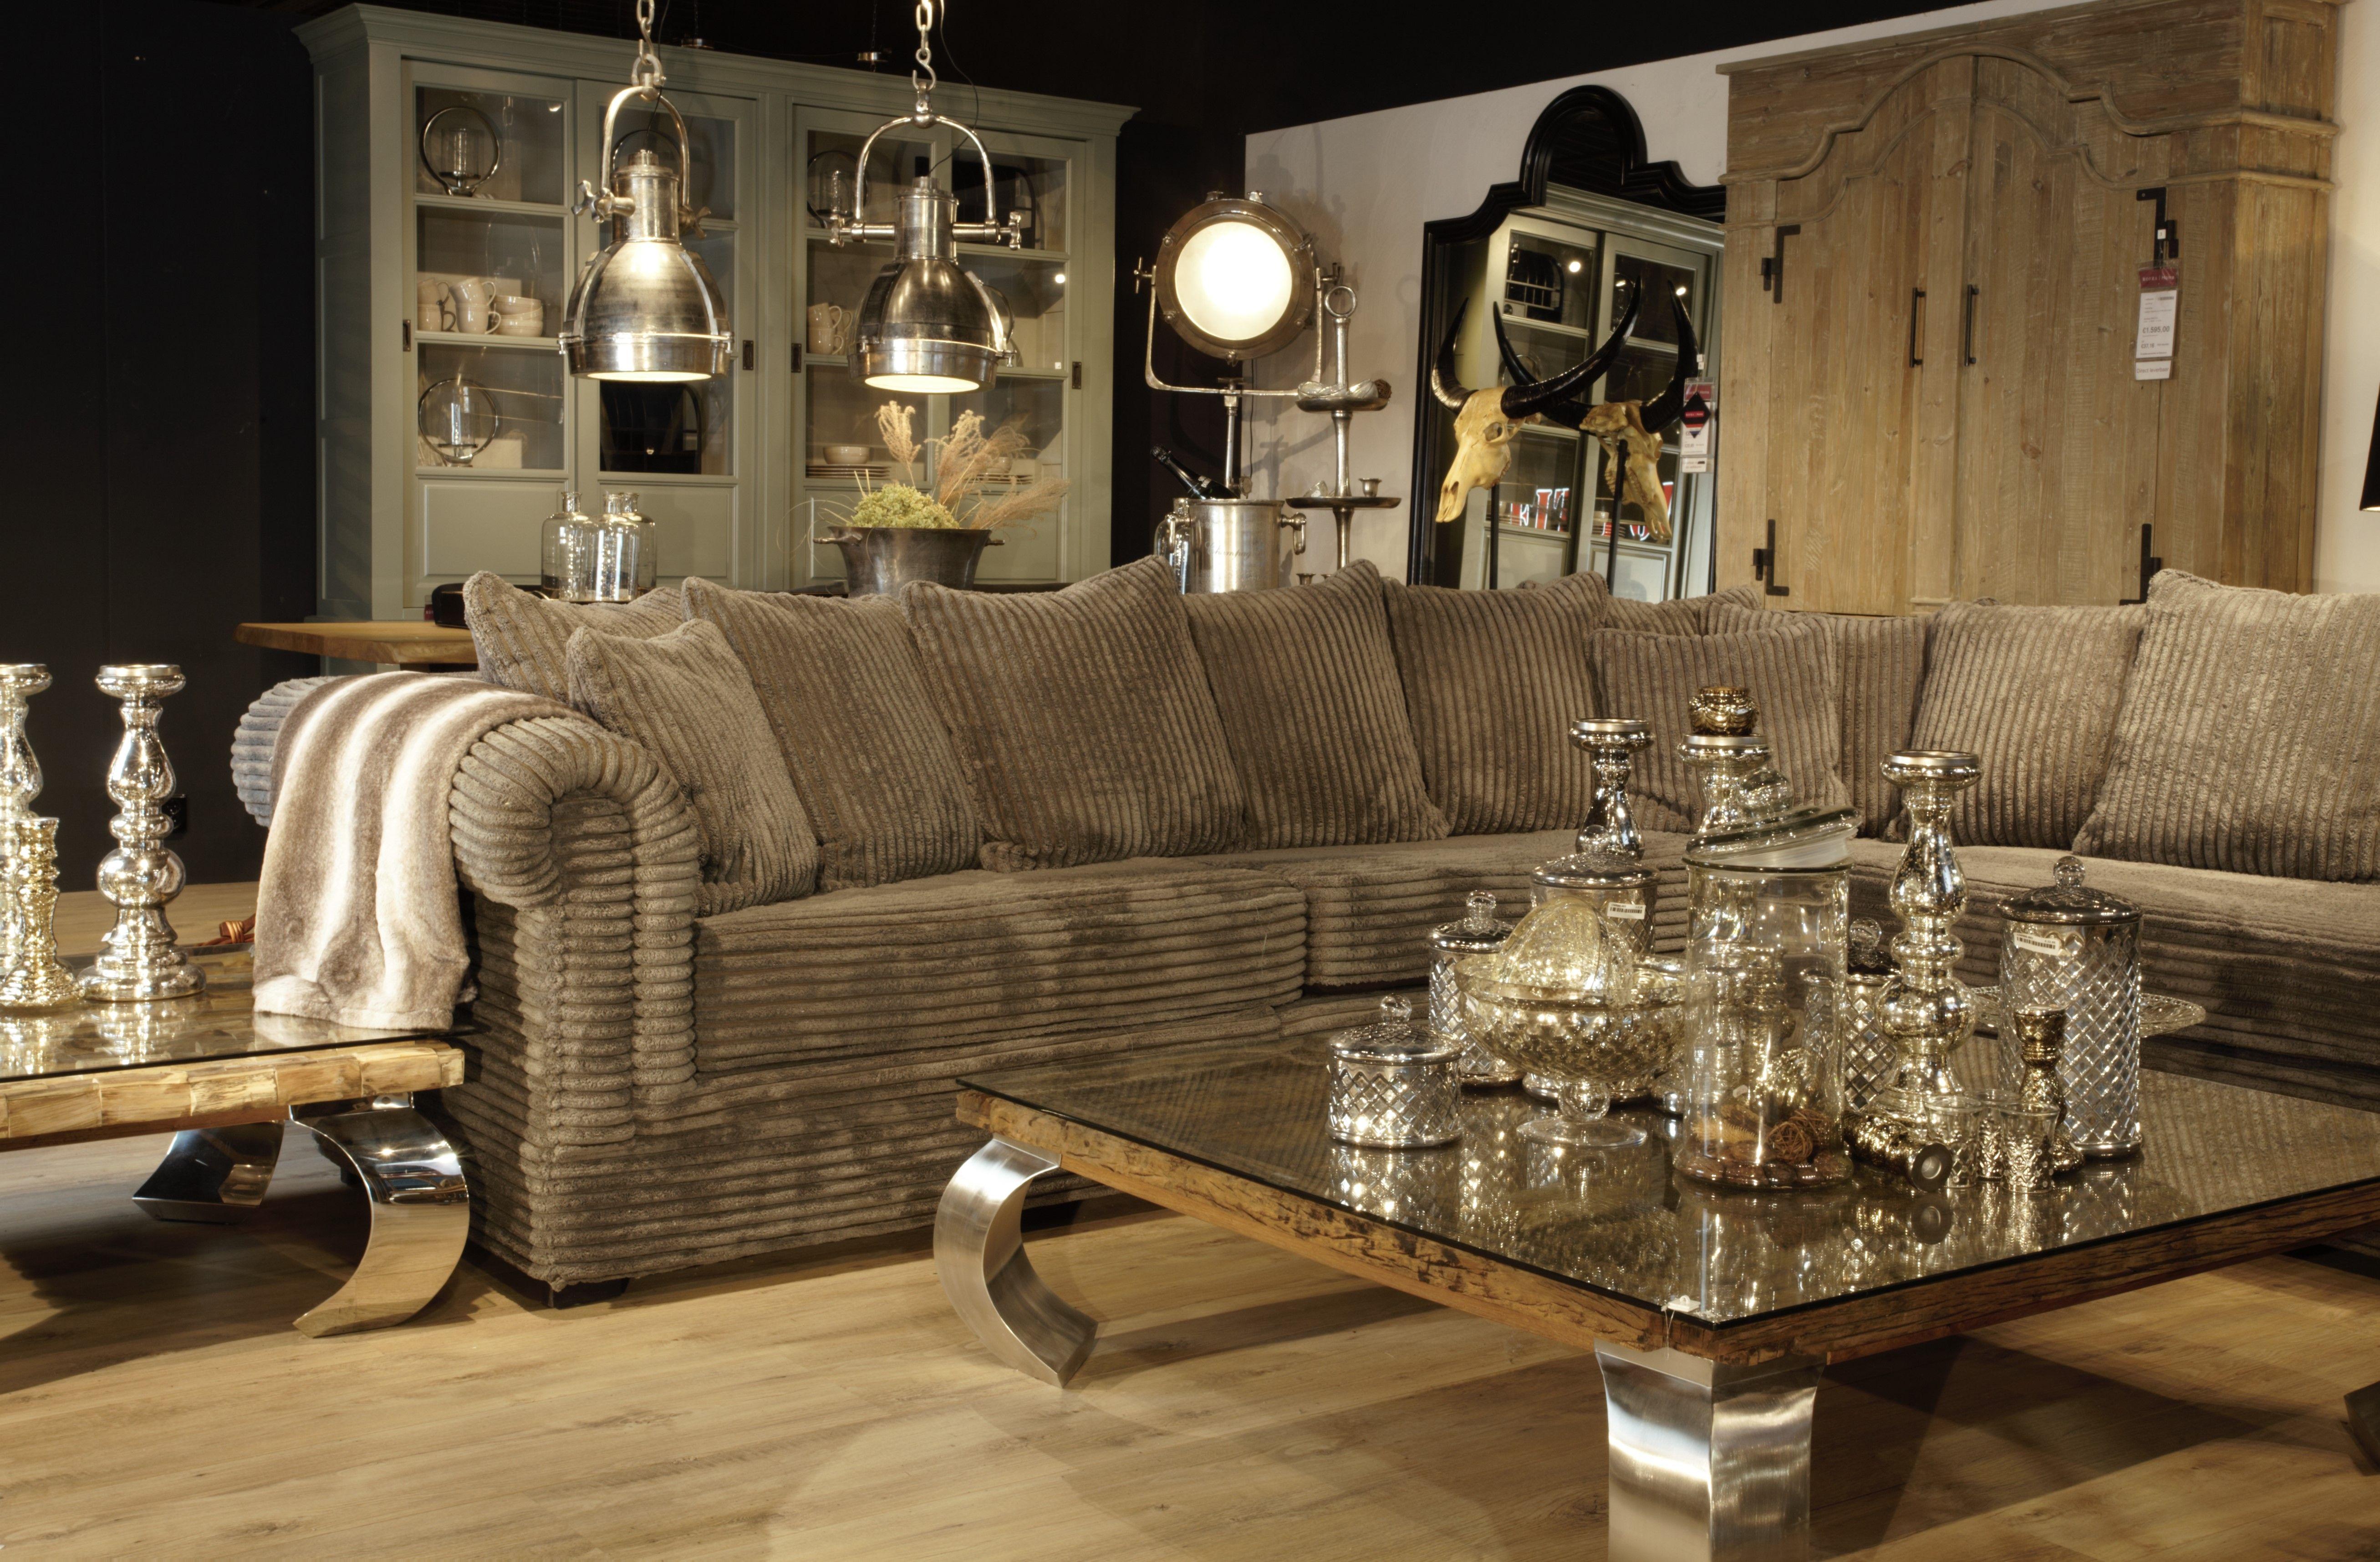 Landelijke woonkamer | Rofra Home | Woonkamer inspiratie | Rofra ...